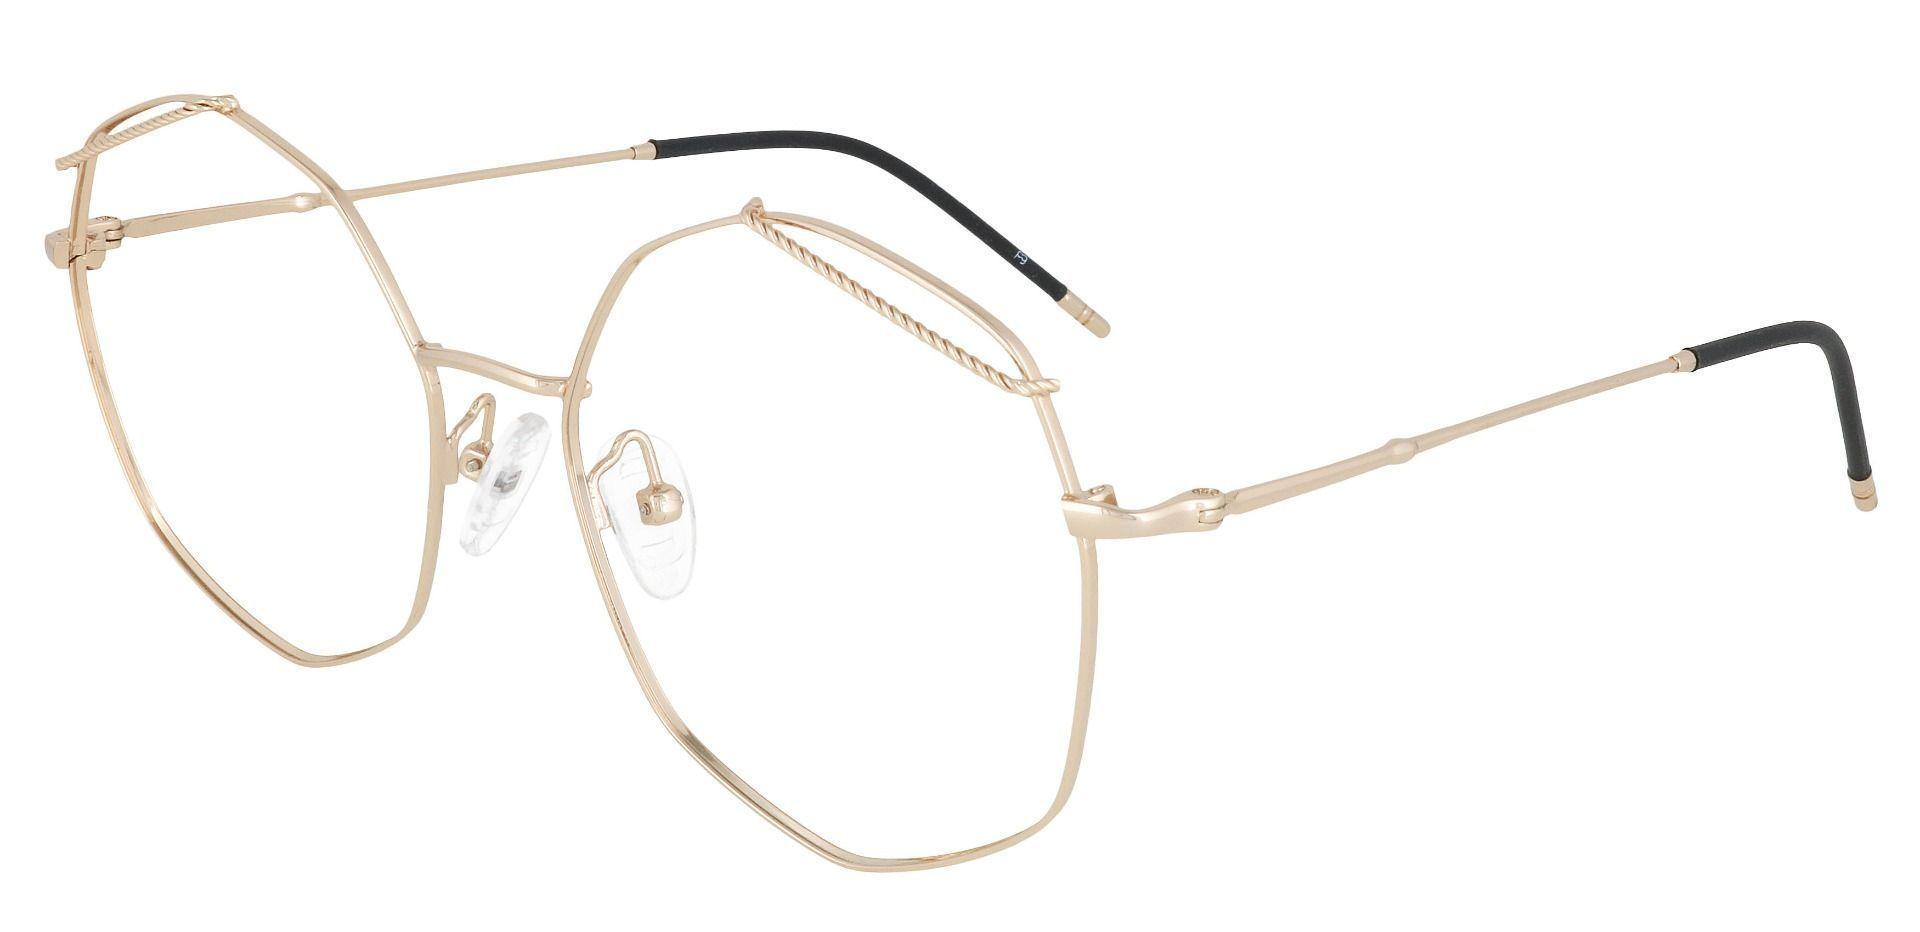 Tango Geometric Prescription Glasses - Yellow